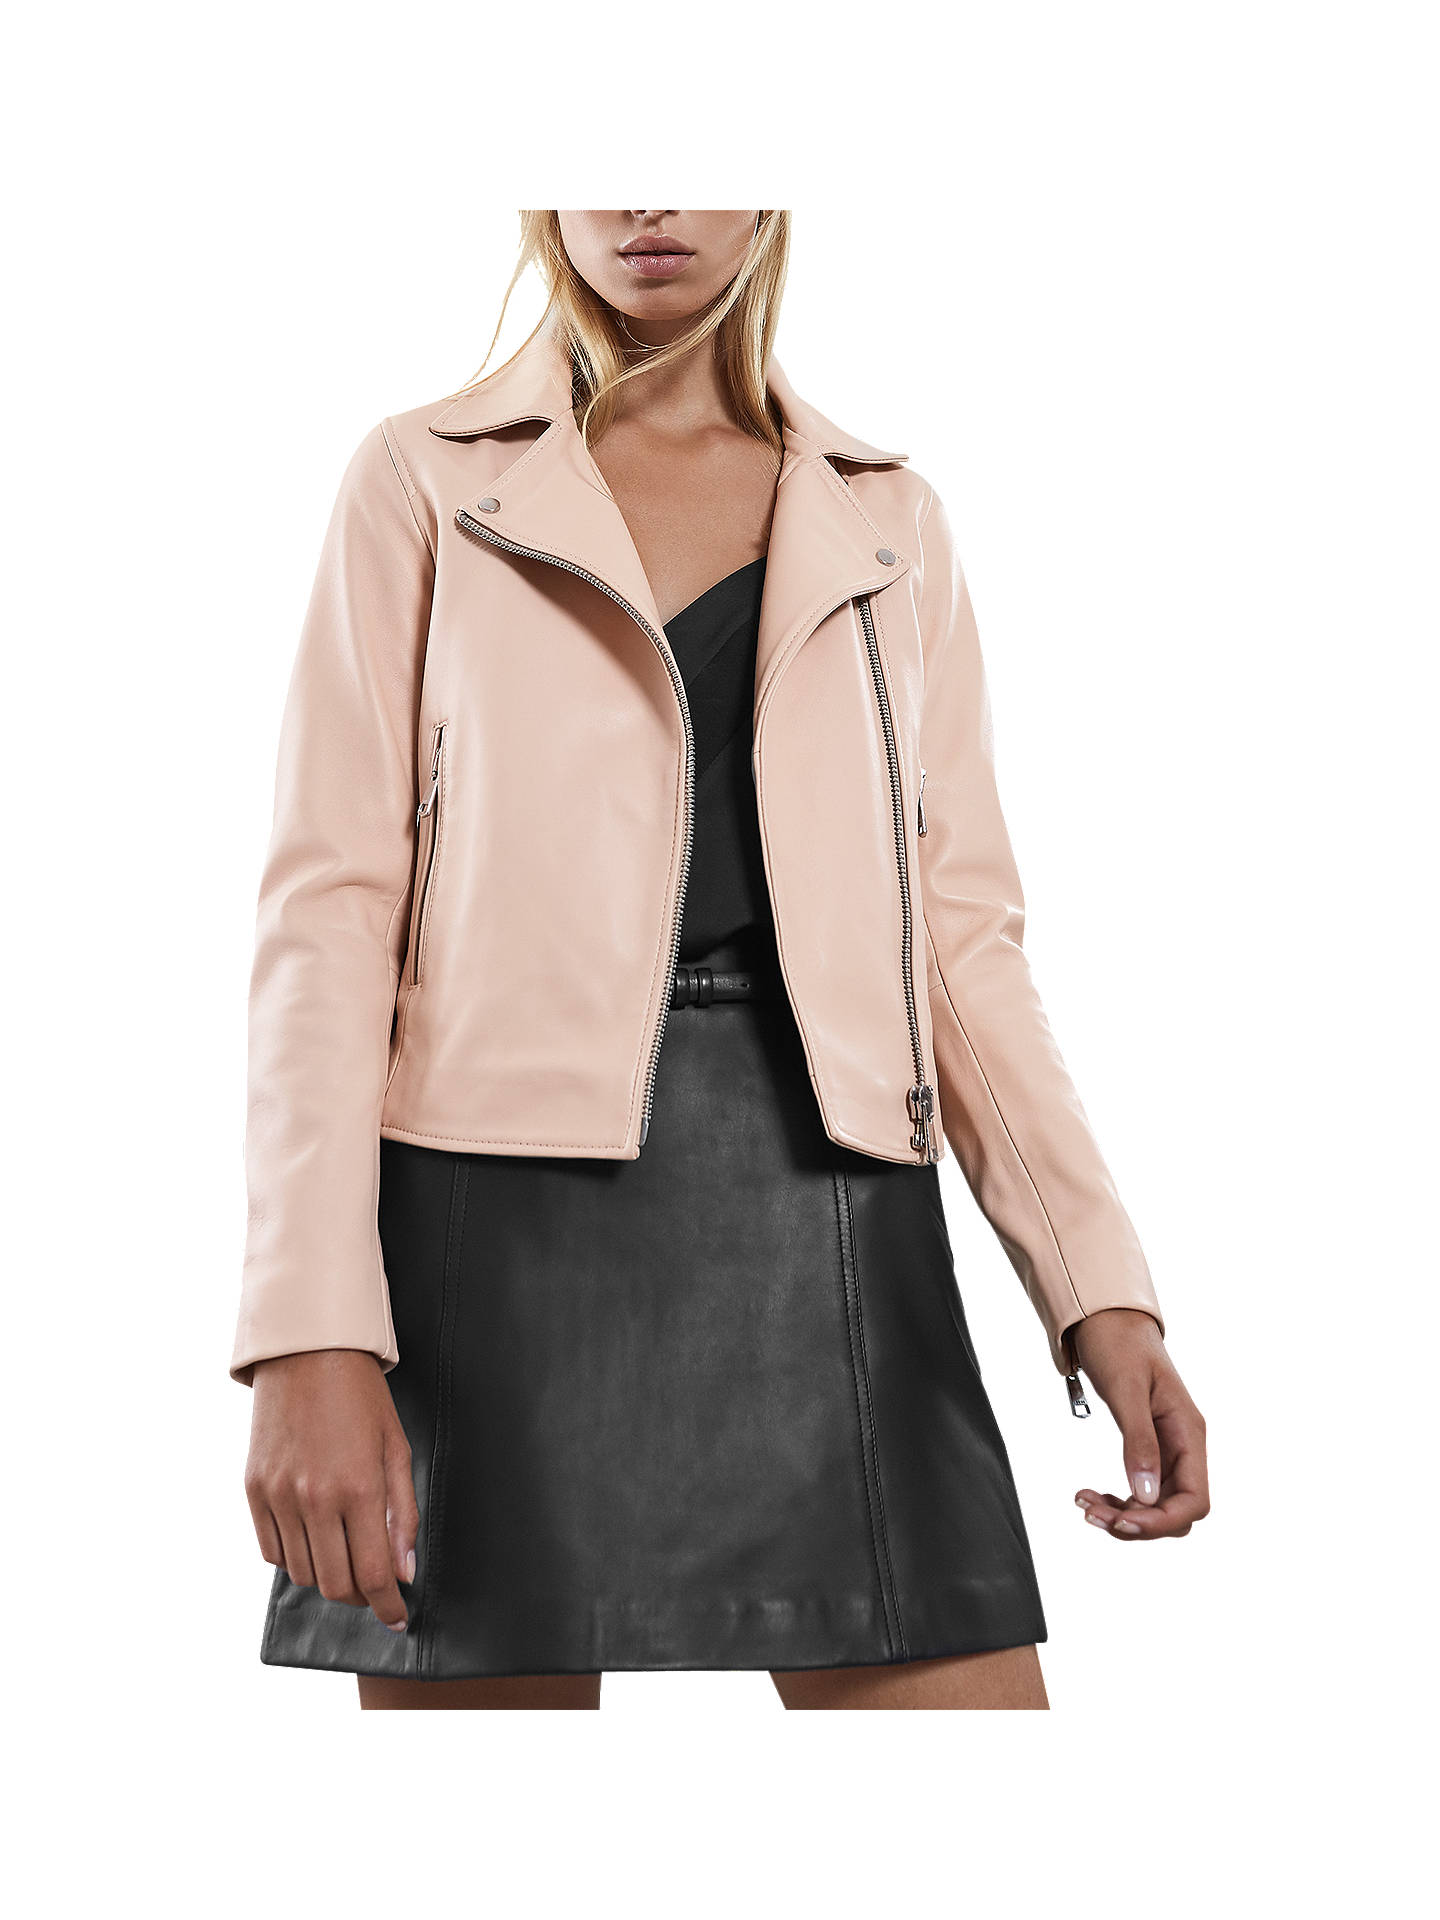 4e1363725de0 Buy Reiss Gia Leather Biker Jacket, Apricot, 6 Online at johnlewis.com ...